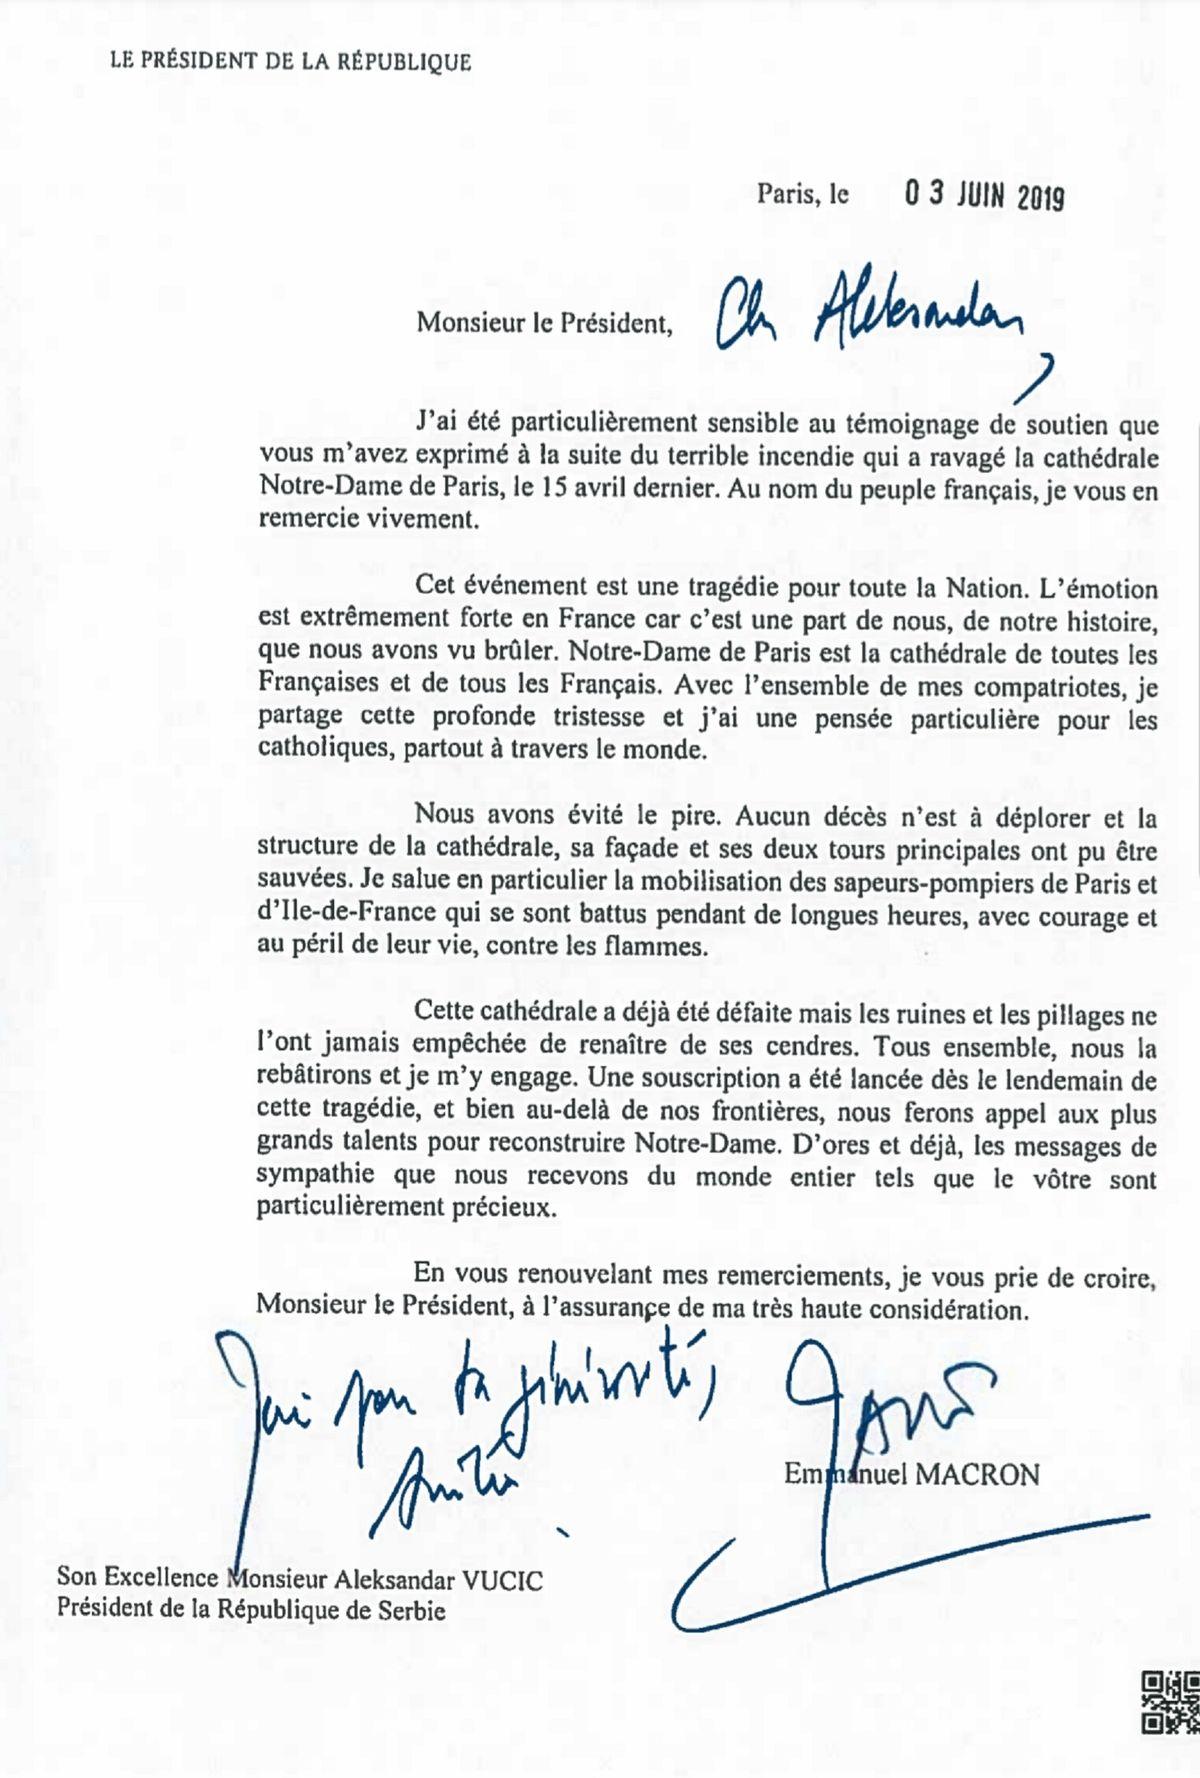 Pismo predsednika Francuske Republike